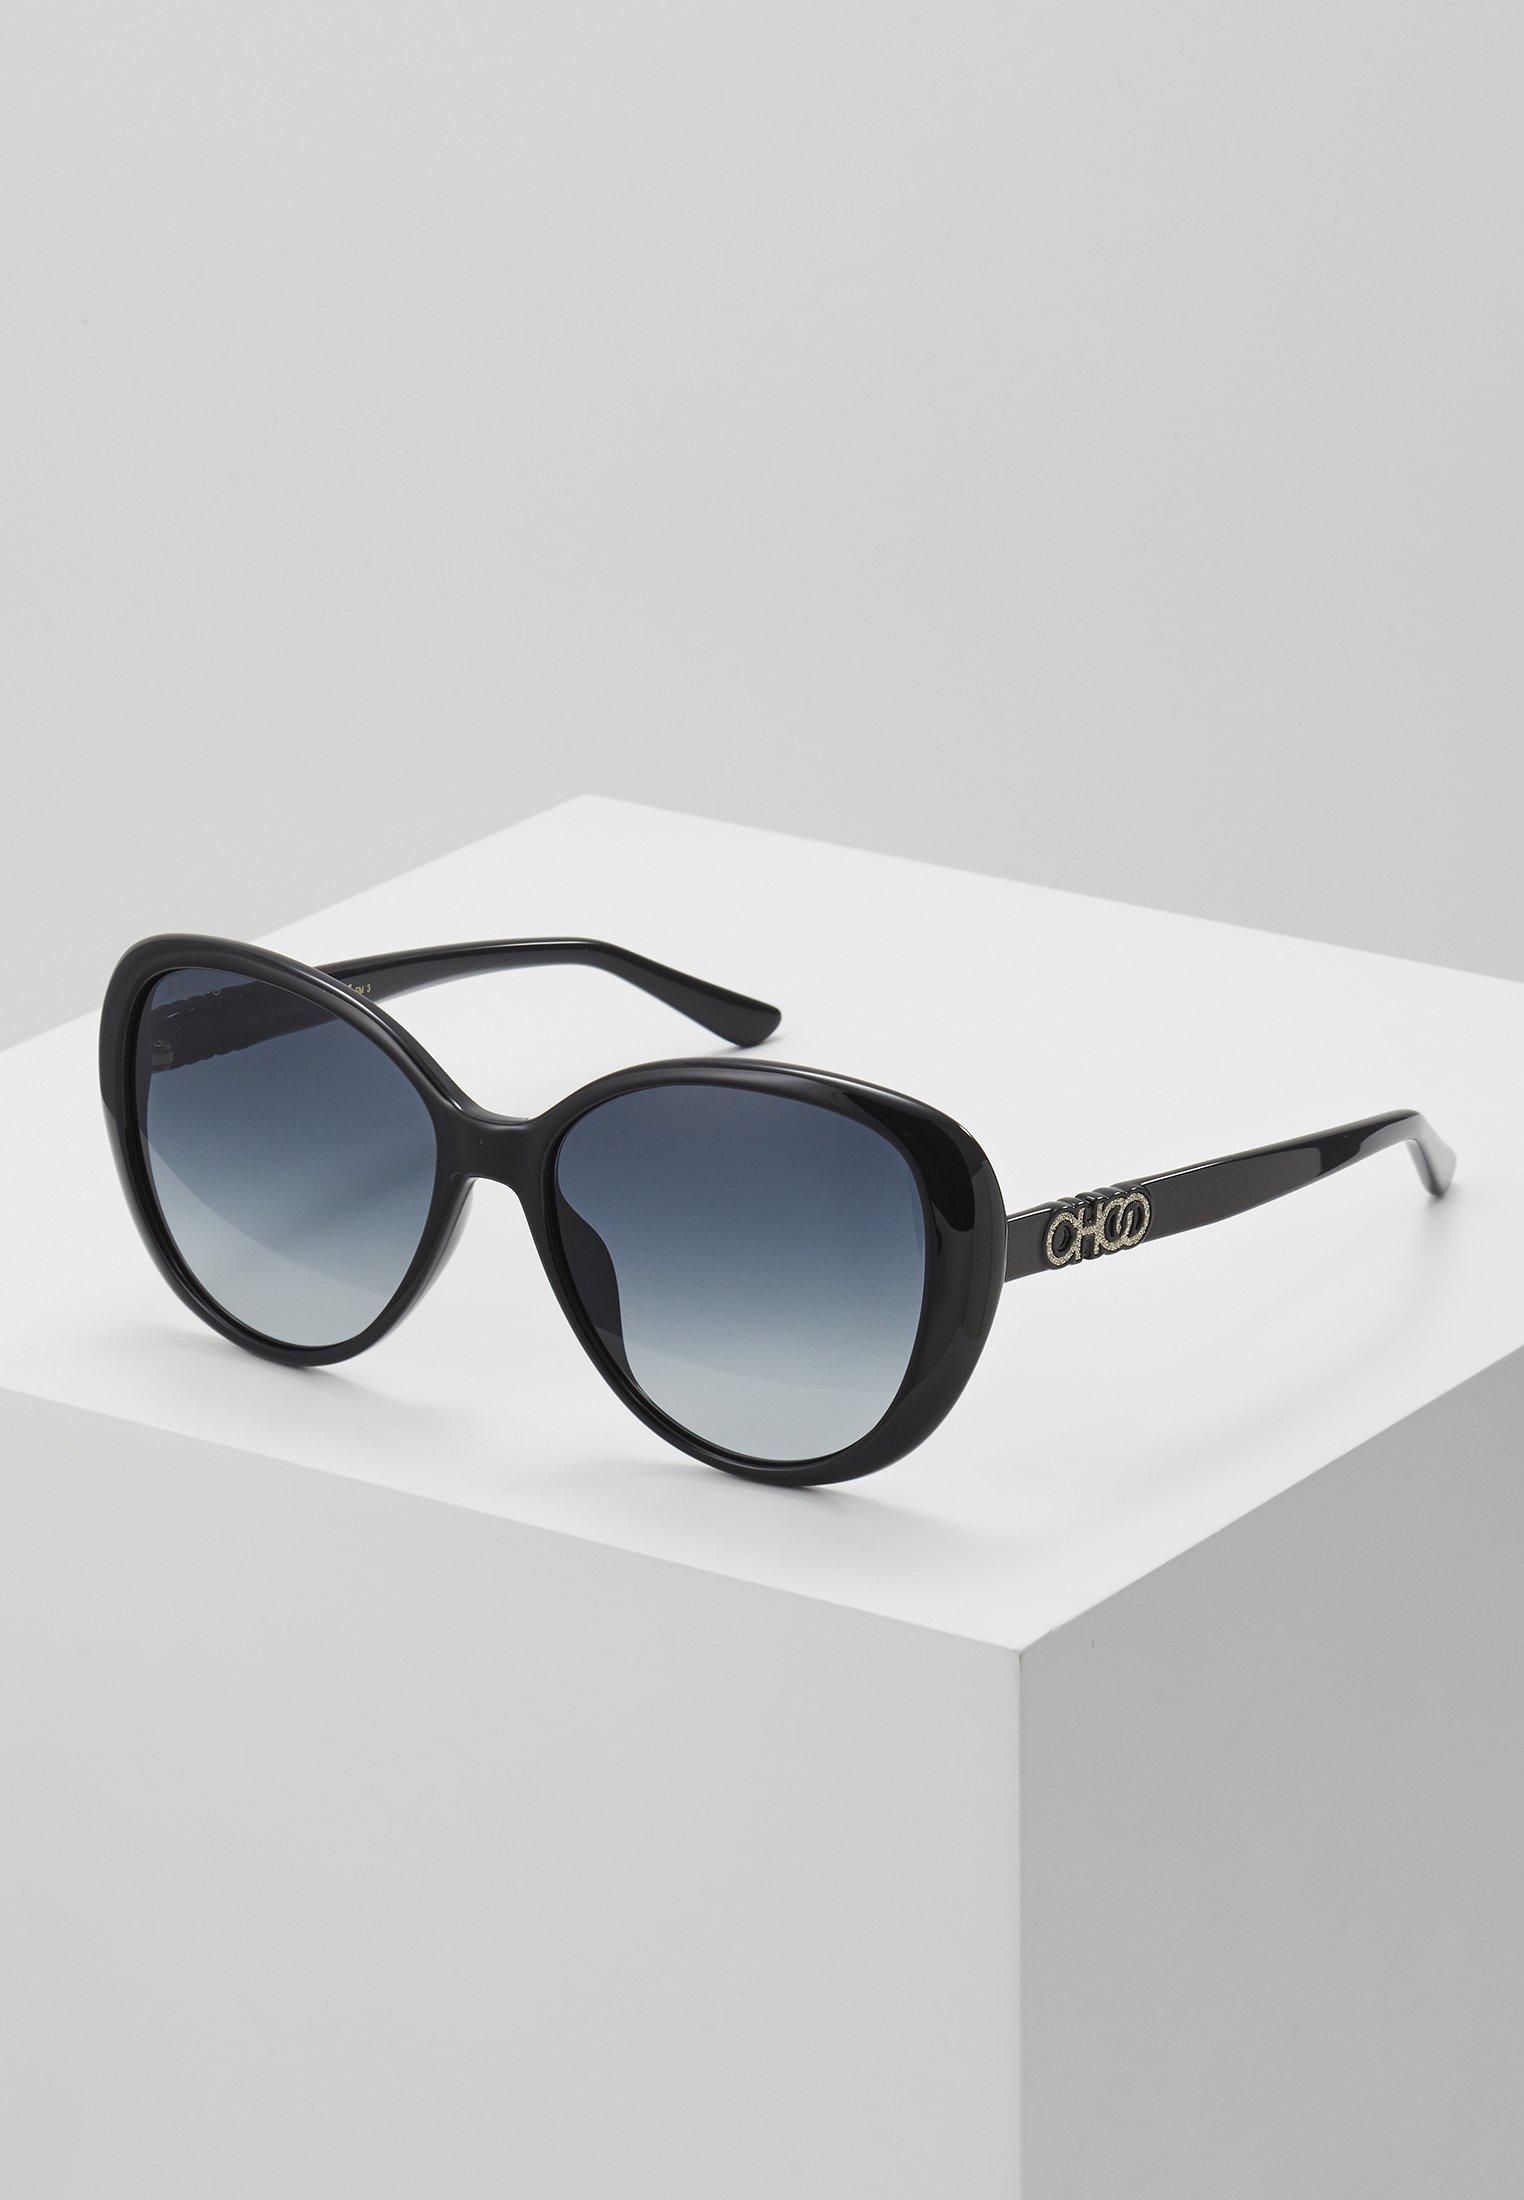 Buy Cool Accessories Jimmy Choo AMIRA Sunglasses black yy2luWric aiOp9tgAR